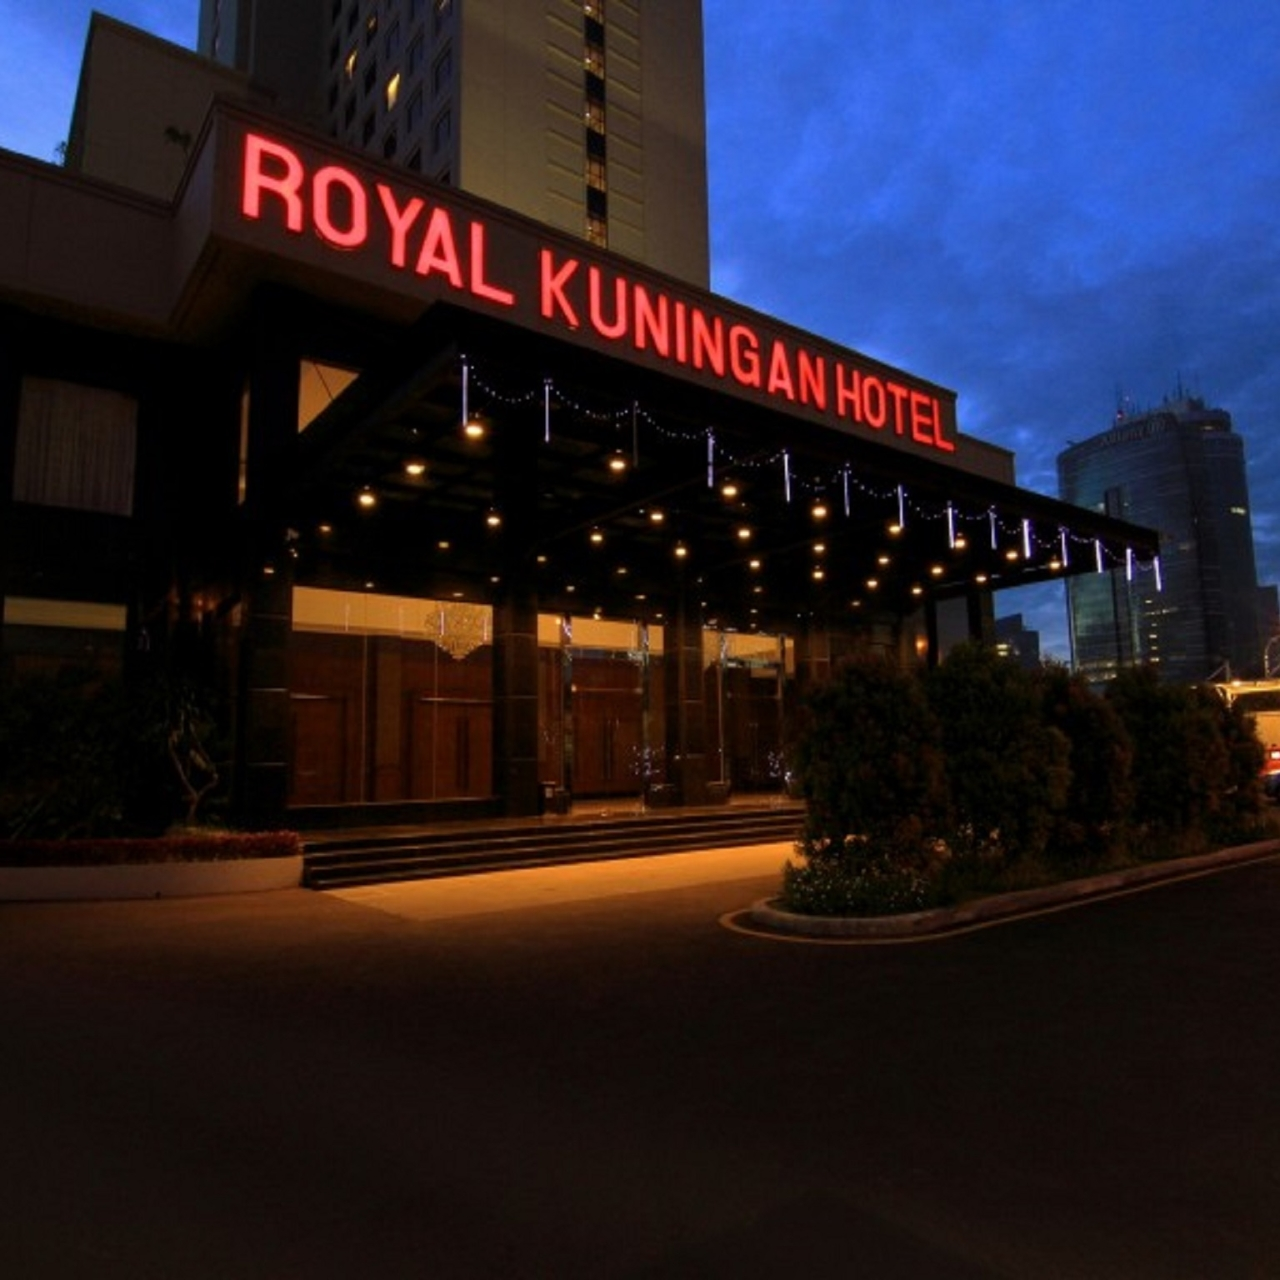 Royal Kuningan Hotel 4 Hrs Star Hotel In Jakarta